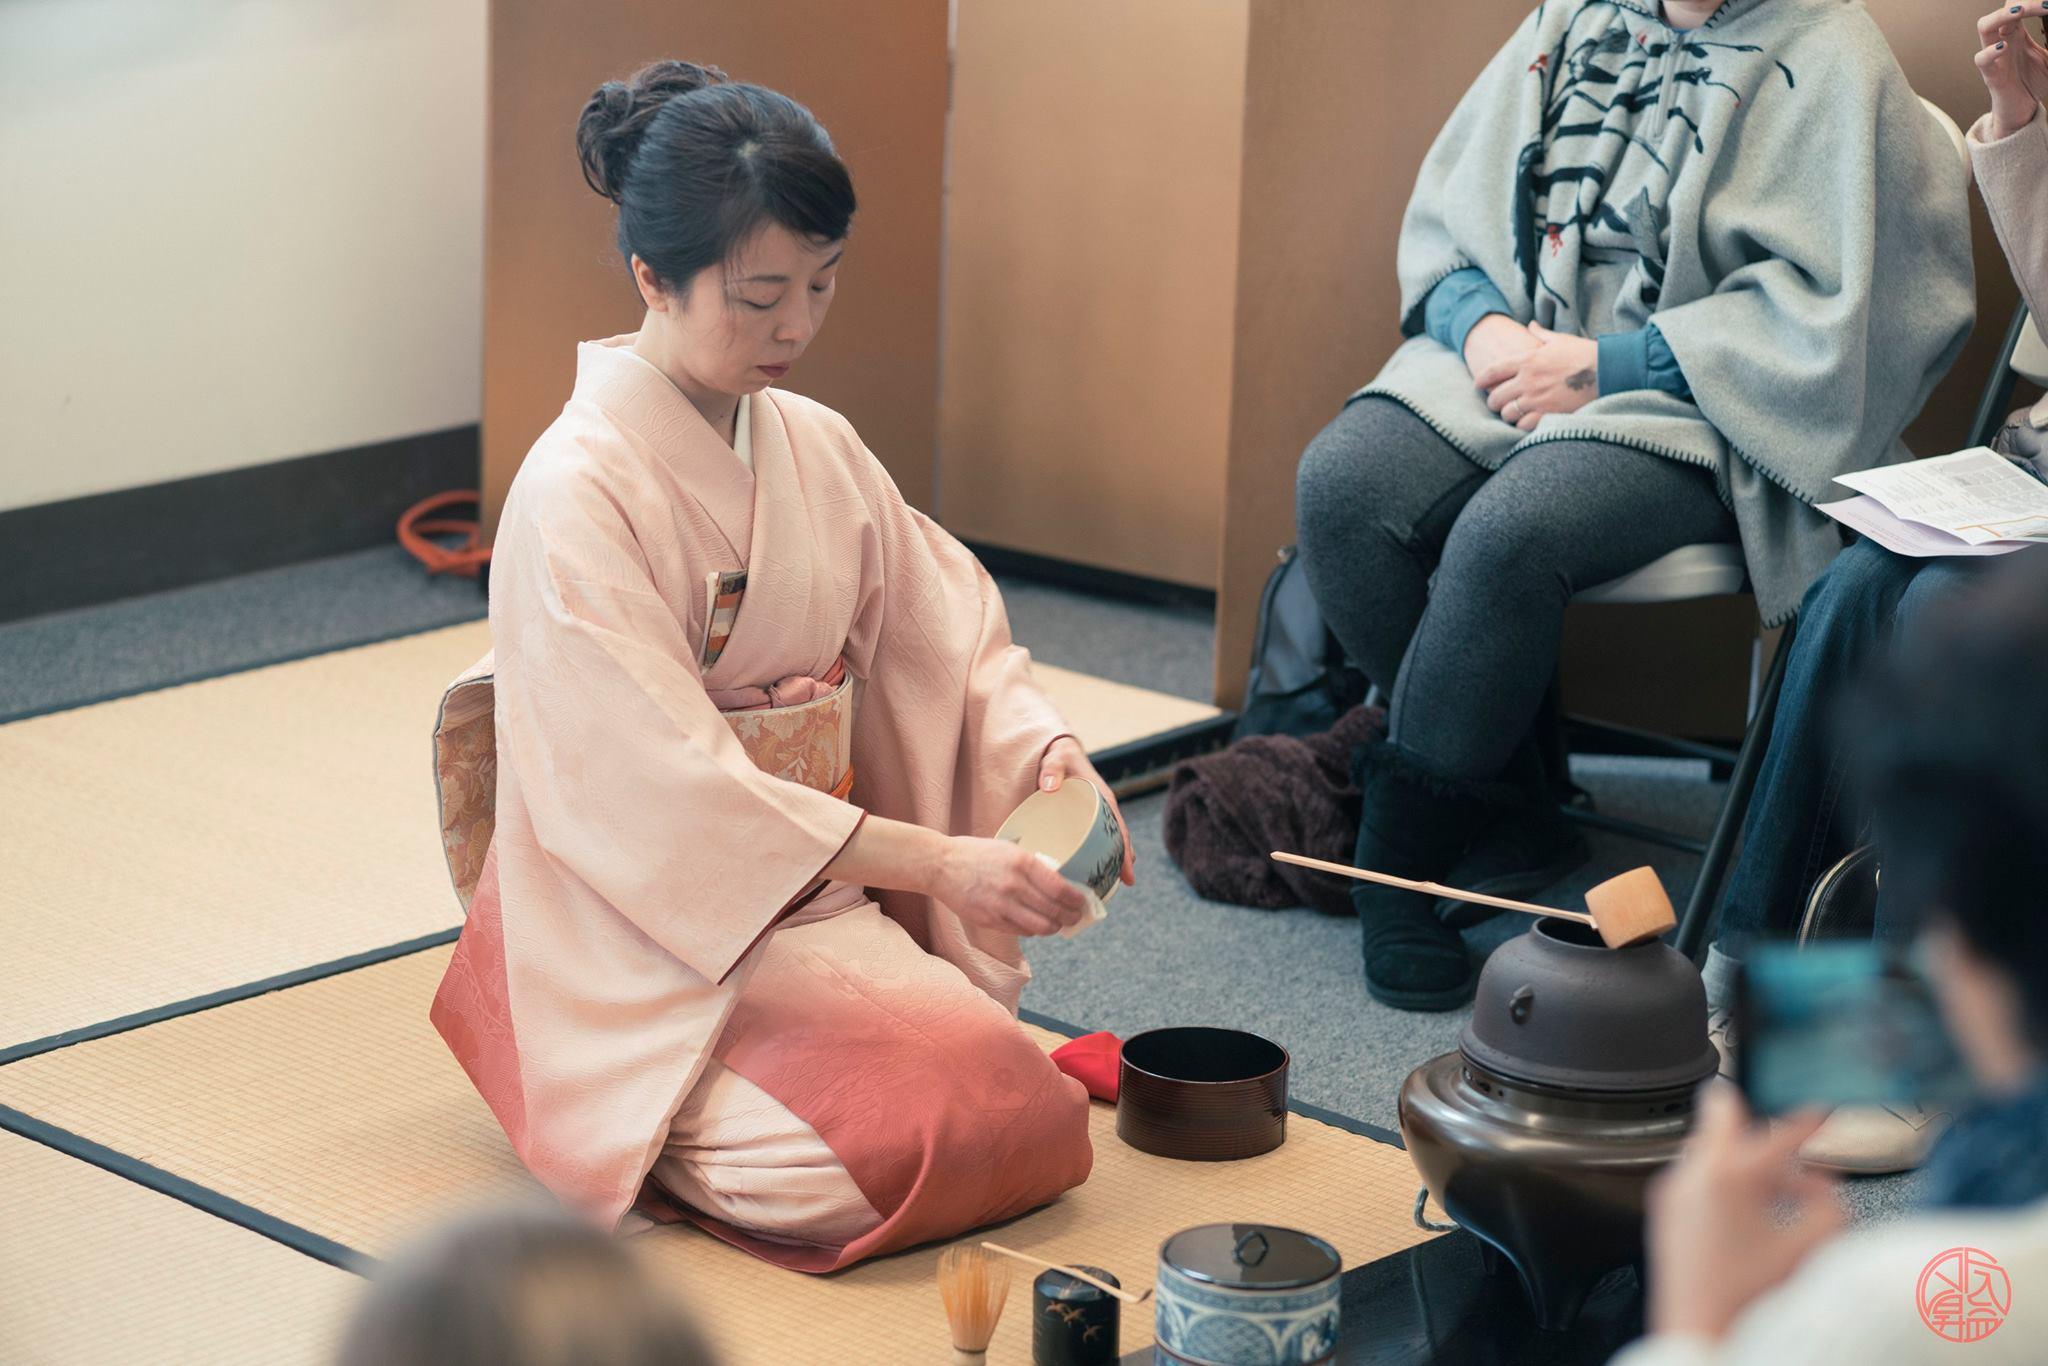 Tea ceremony demonstration during Bunka no Hi 2017. Photo by Jason Go.